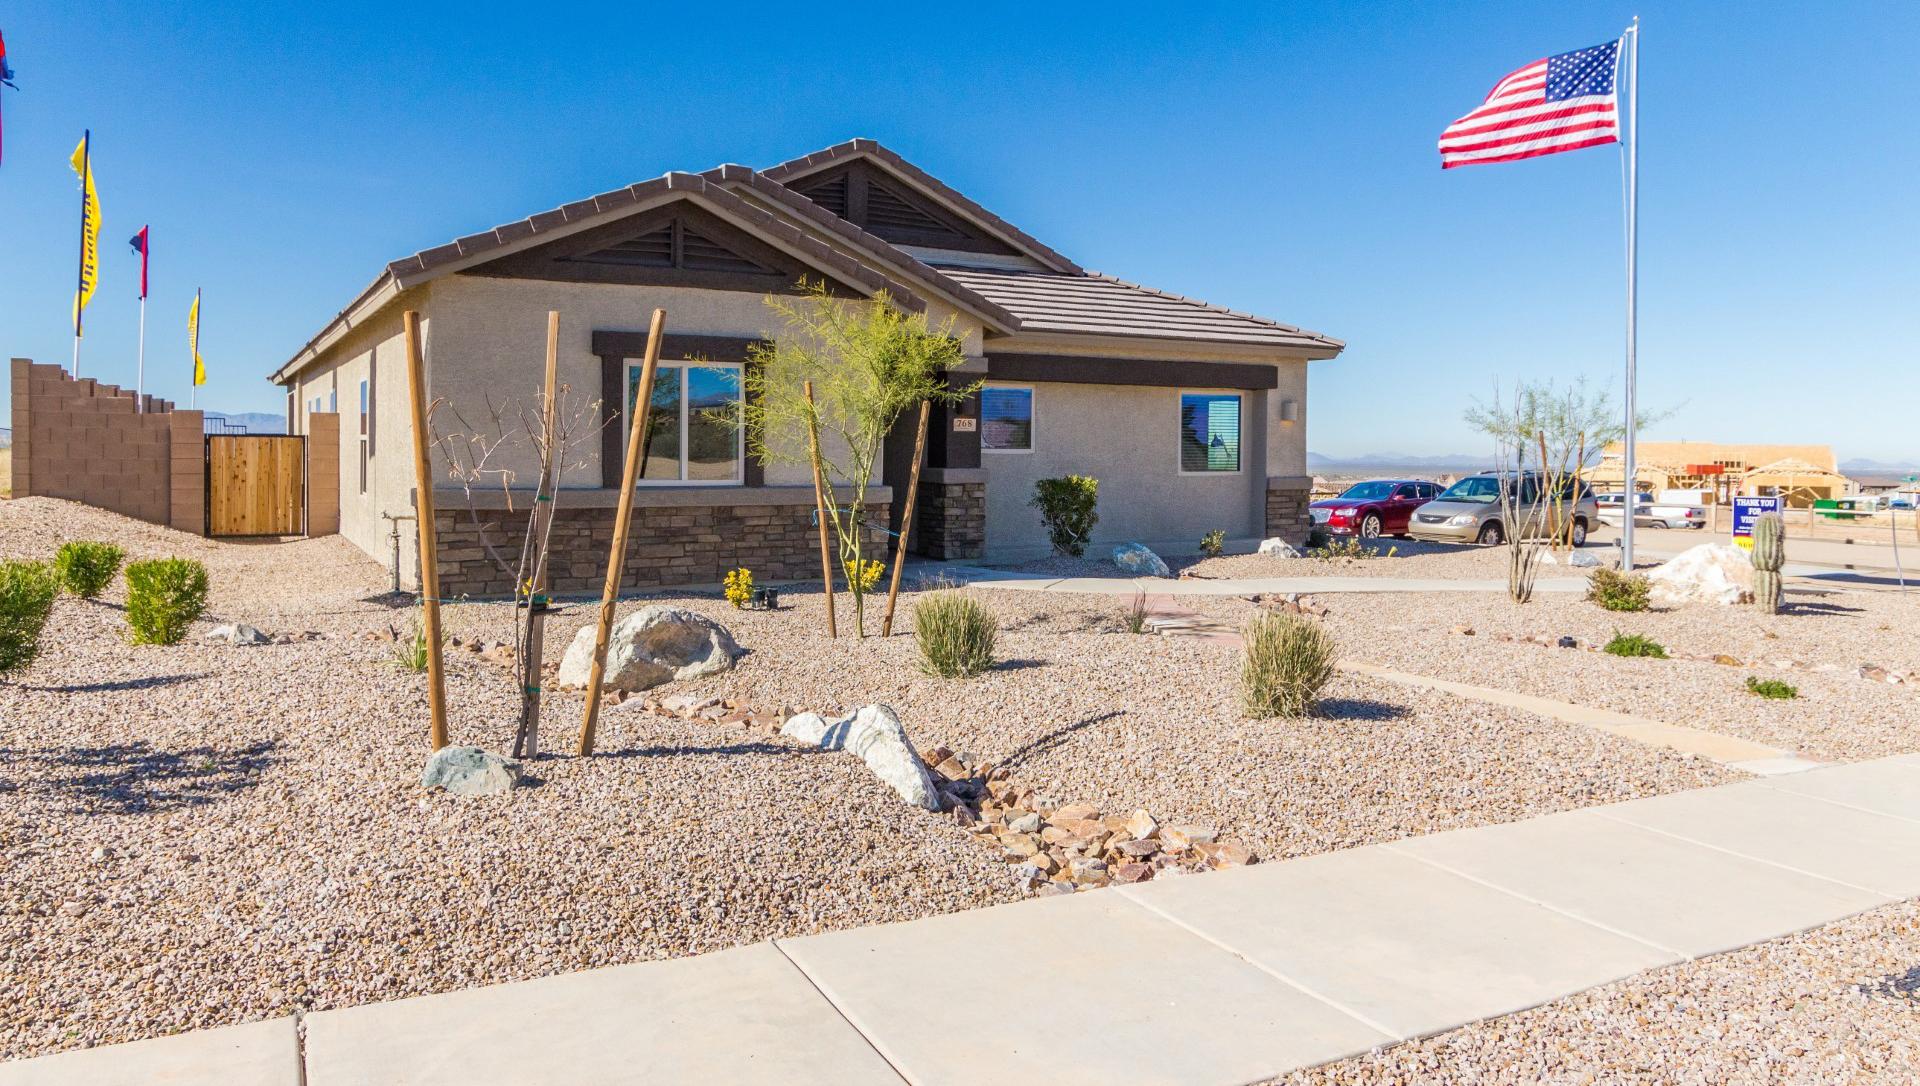 New Homes in Sycamore Vista | Vail, Arizona | D R  Horton